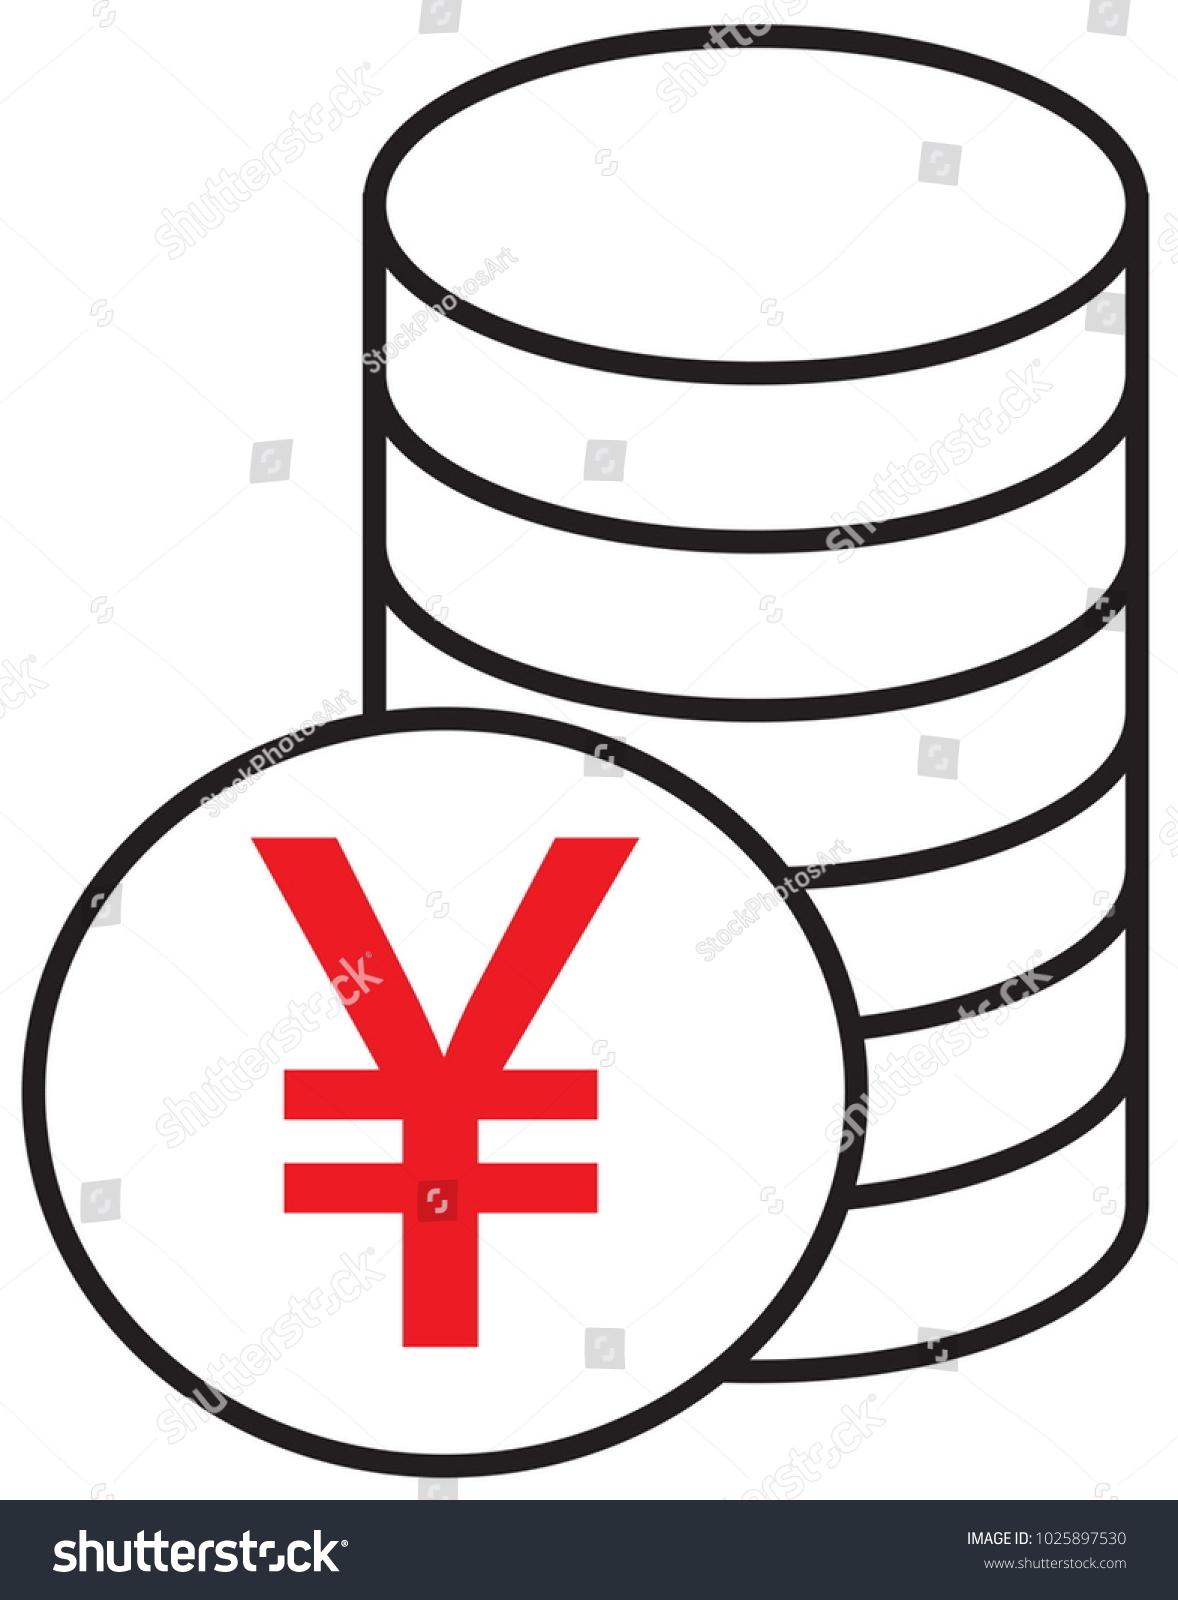 Yen Yuan Renminbi Currency Icon Logo Stock Vector 1025897530